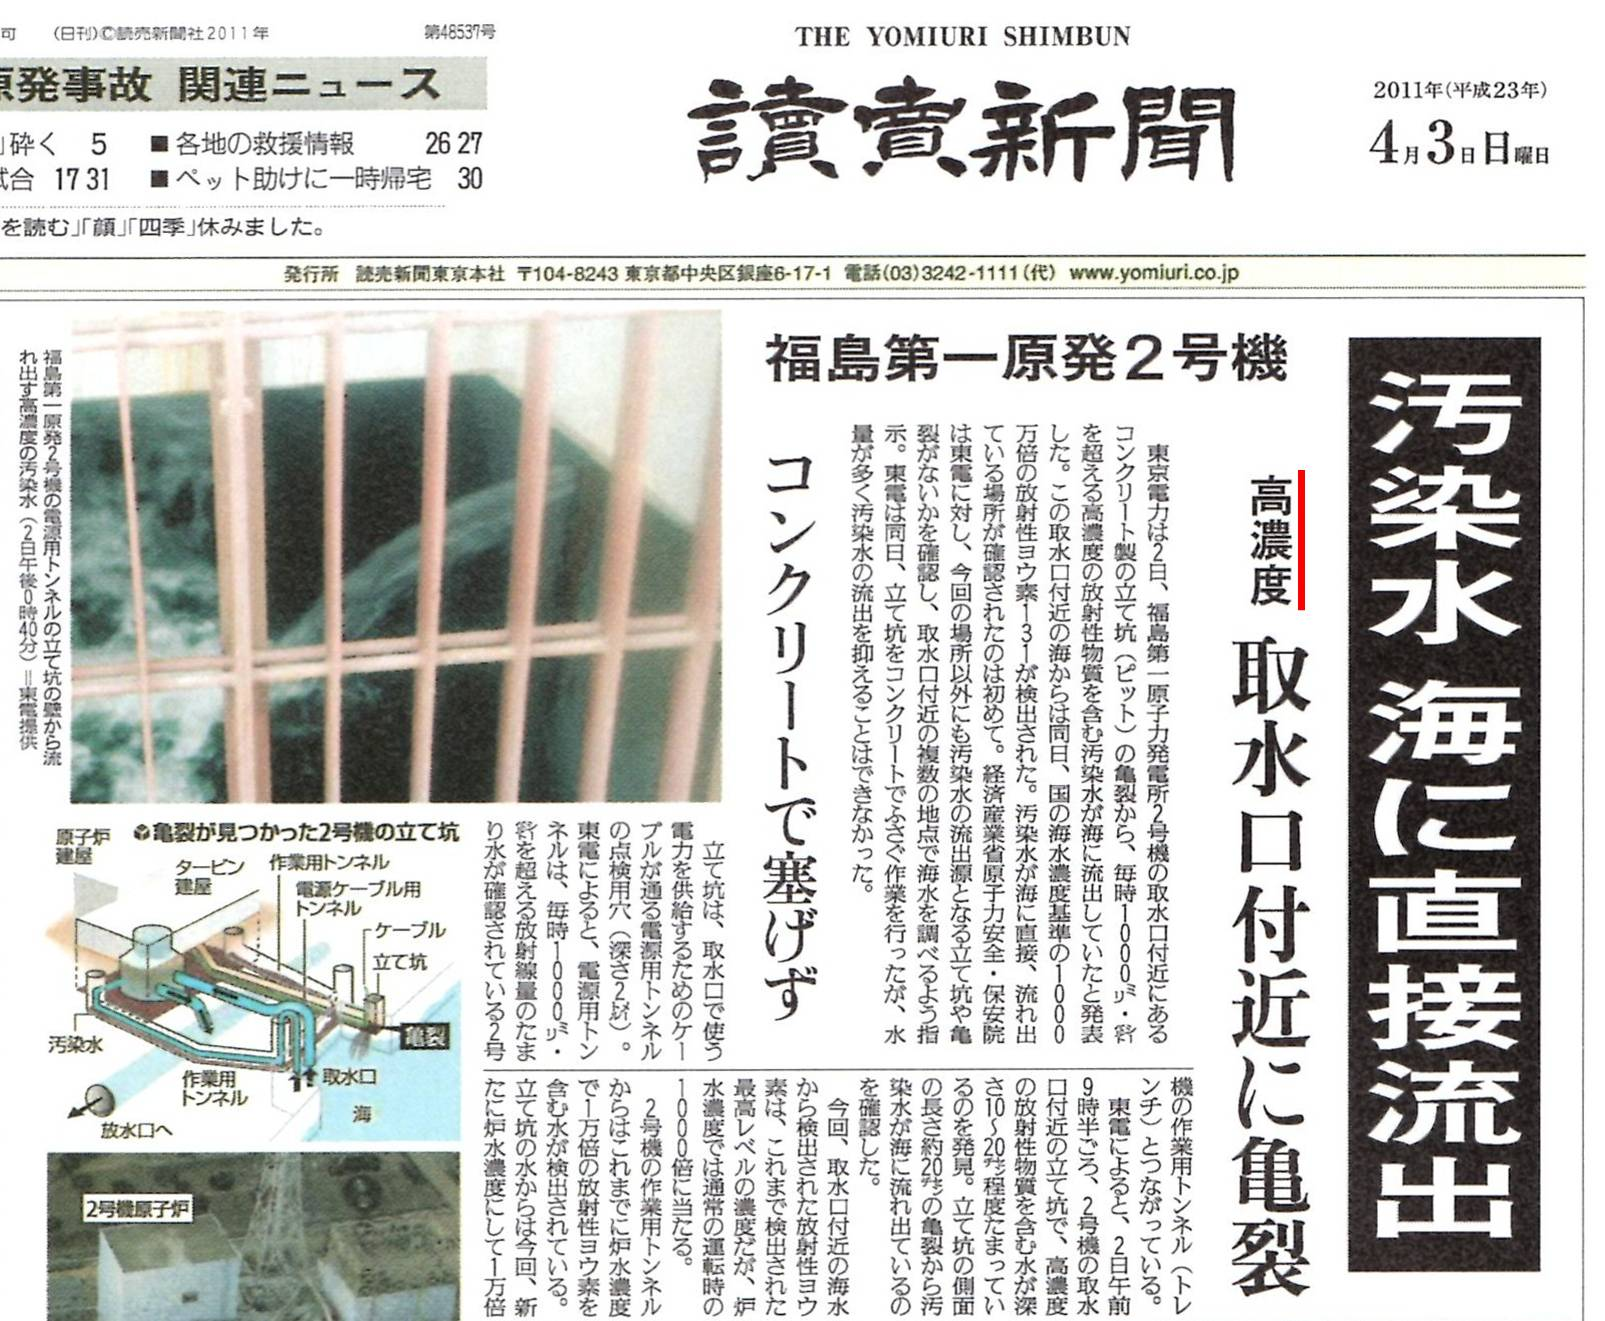 yomiuri shinbum aim about international media